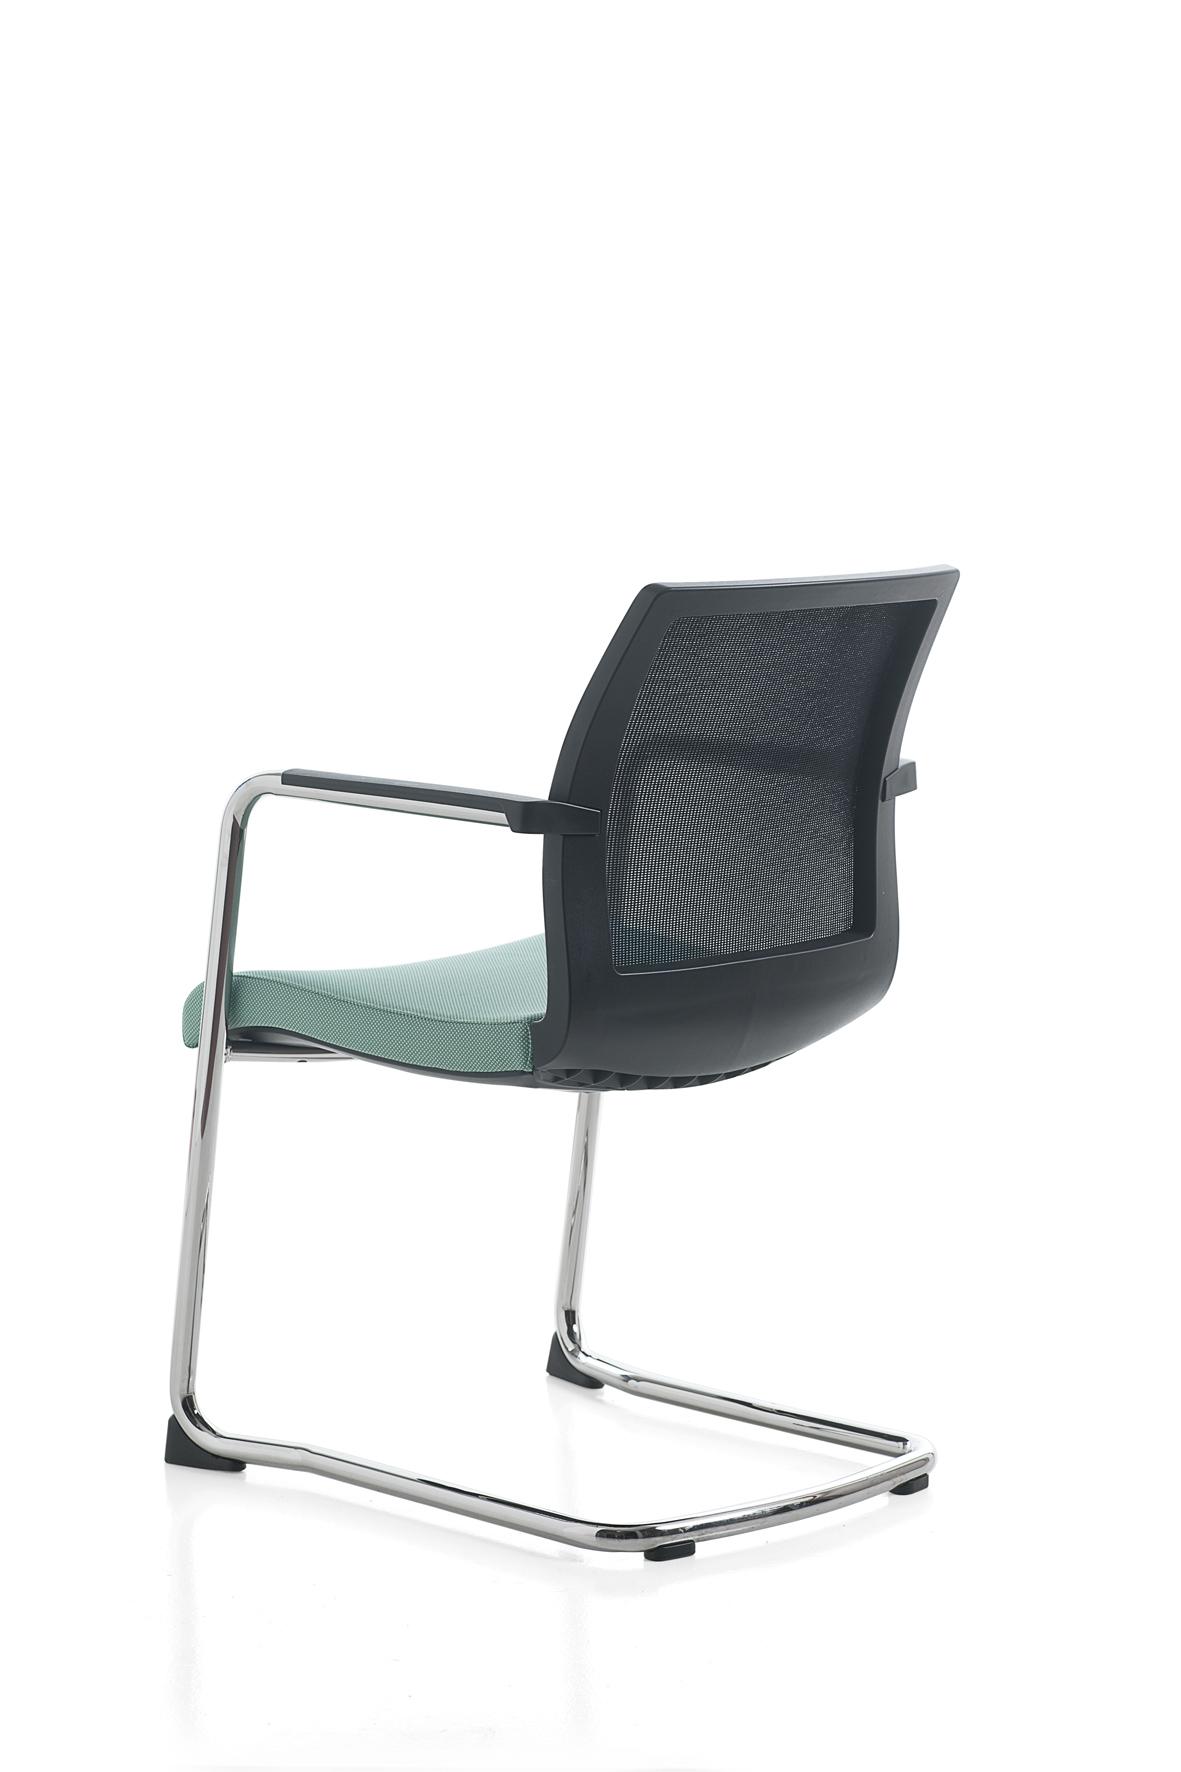 Karma chair kastel sedute per ufficio comunit e casa for Kastel sedie